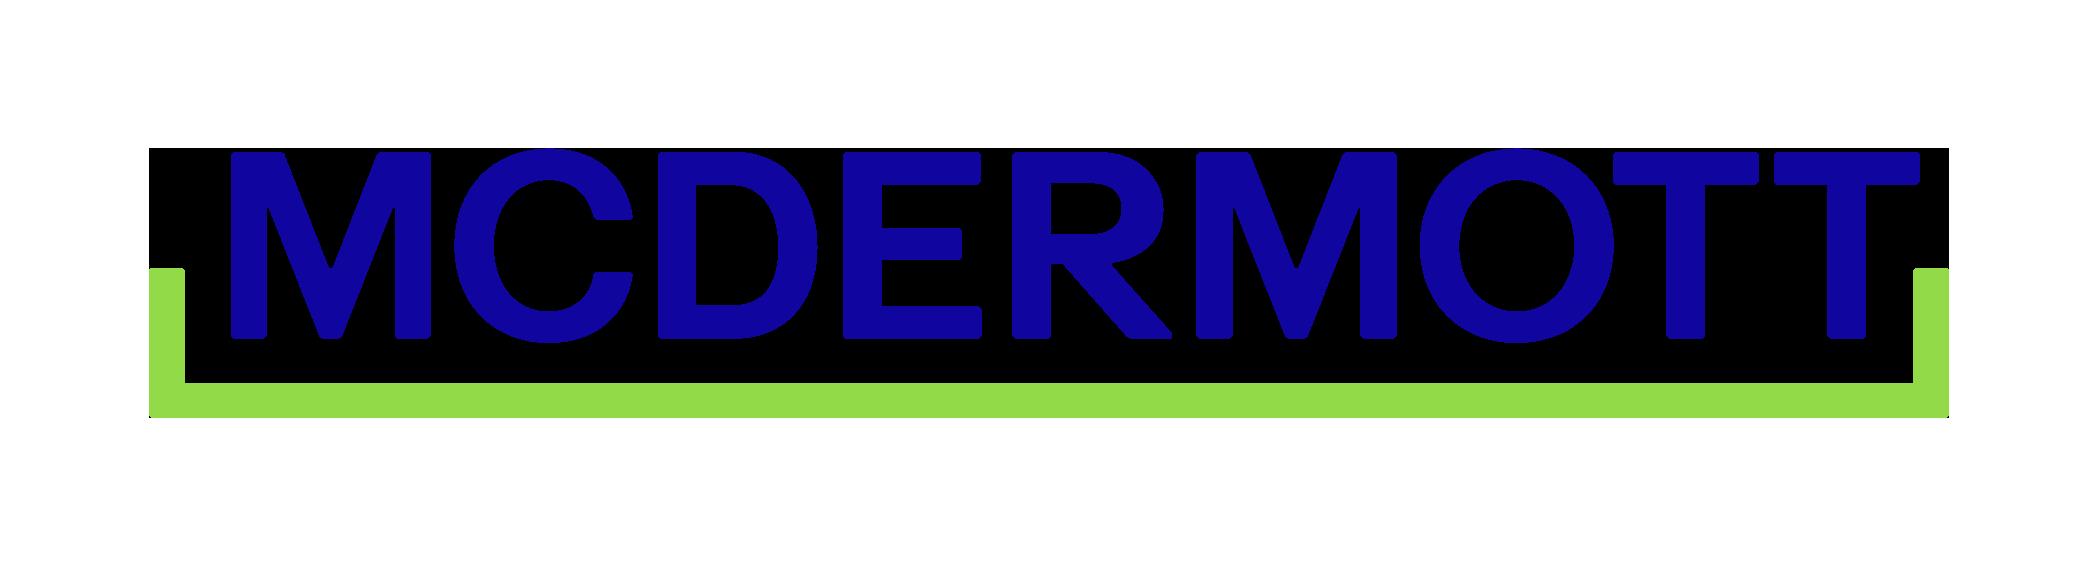 mcdermott_logo_color_rgb